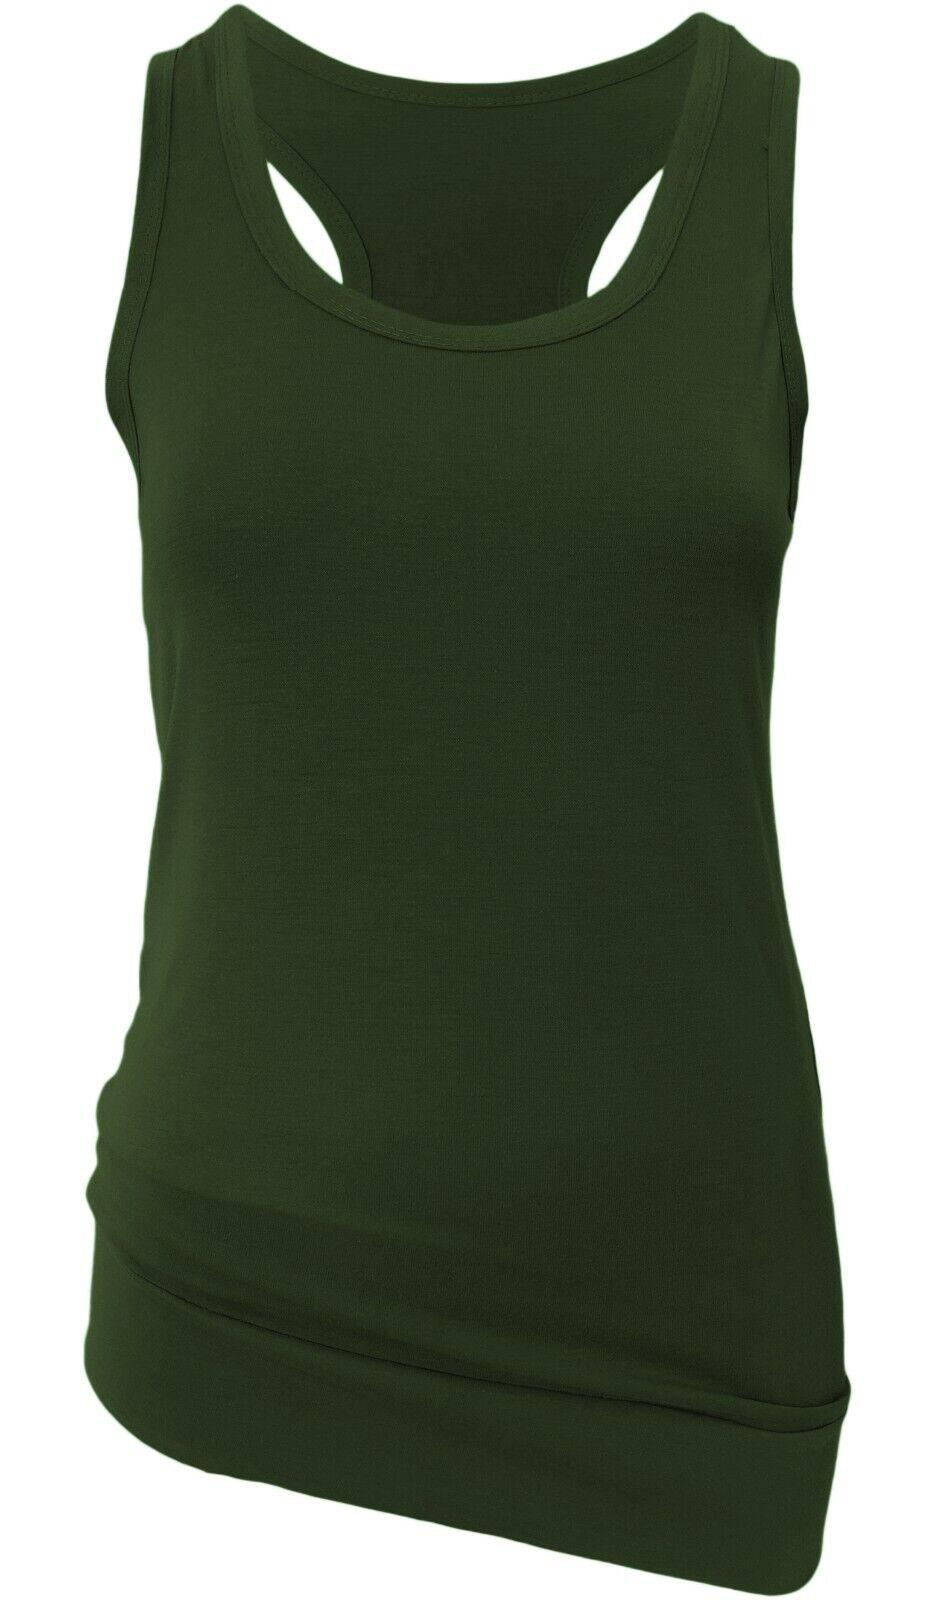 Tank Tops Damen 2er Set Viskose Sport Freizeit Tops lange Träger-Shirts GR 36-40